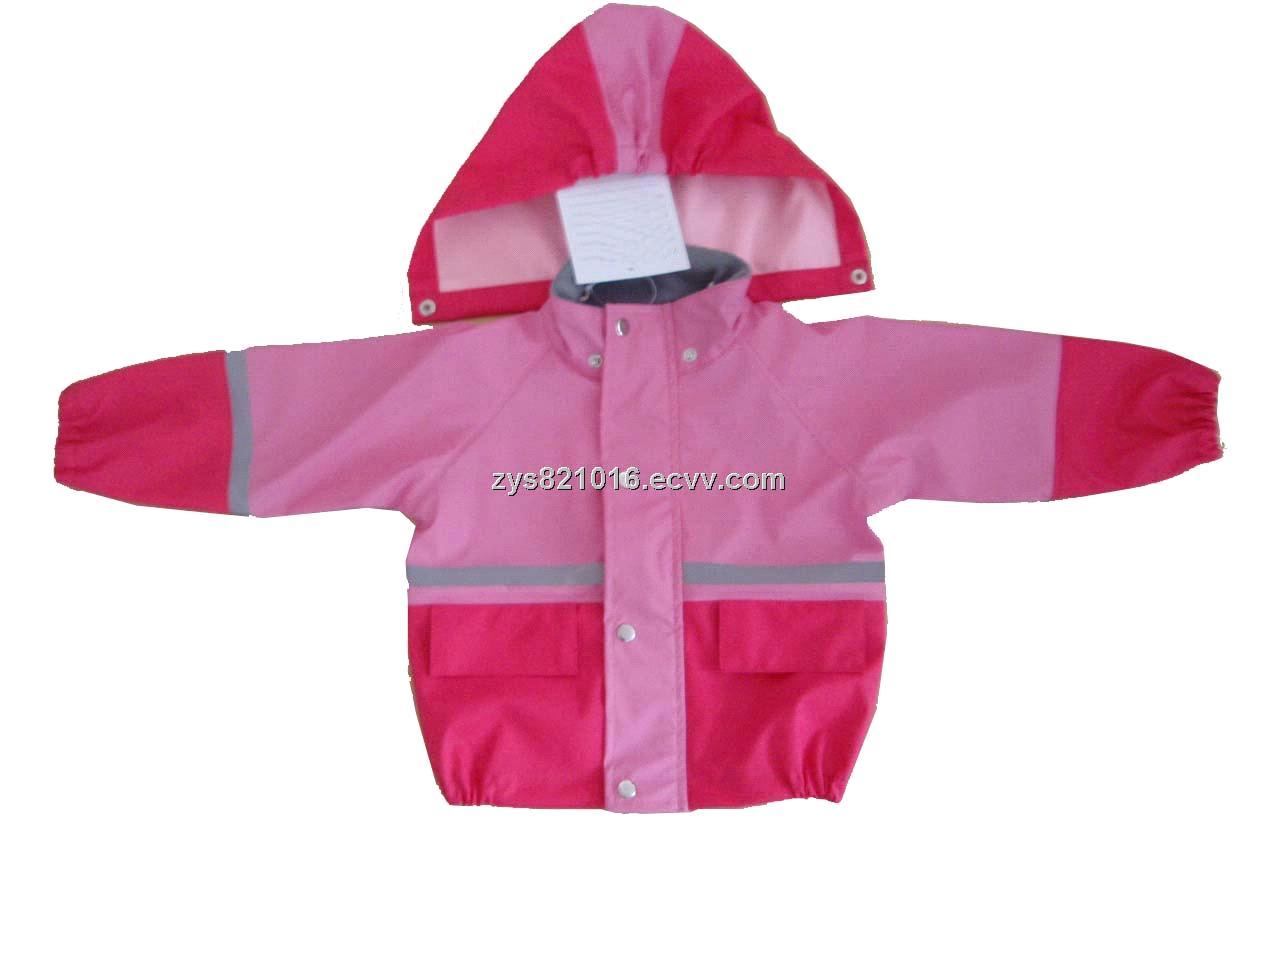 639f8e1a9 kids rain wear purchasing